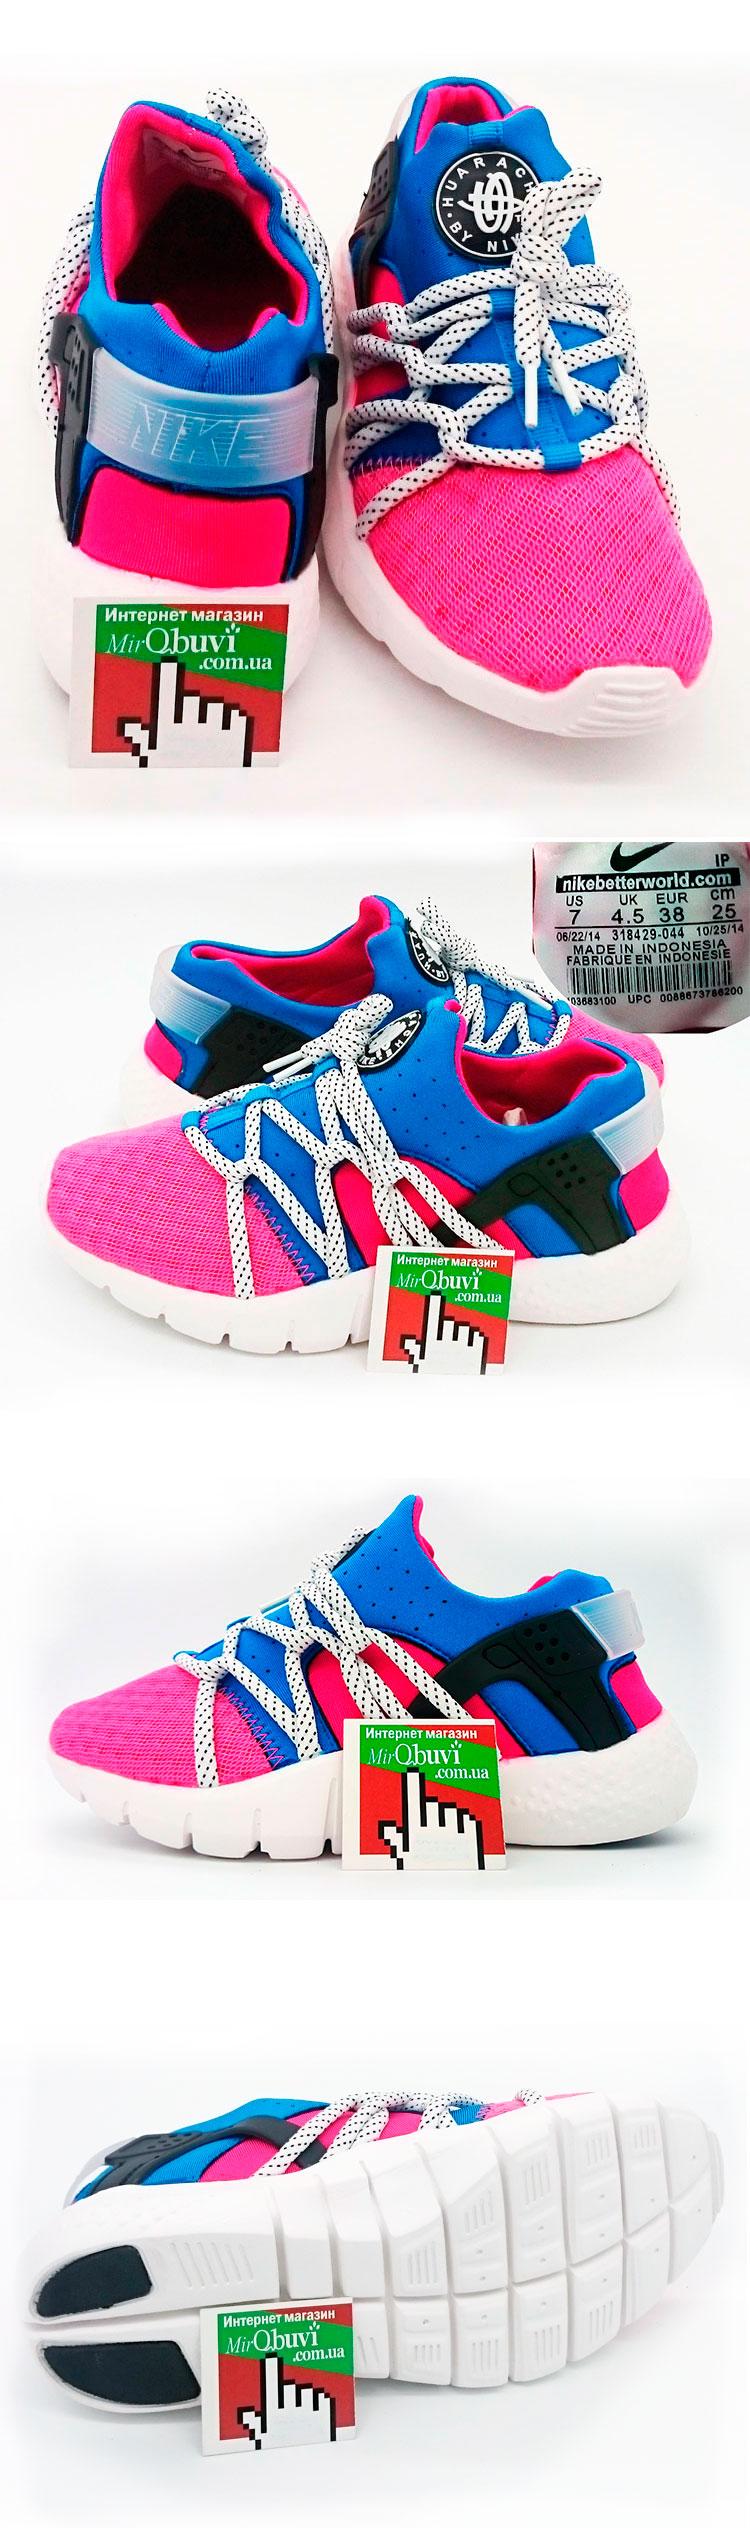 большое фото №5 Женские кроссовки Nike Huarache NM розово-синие